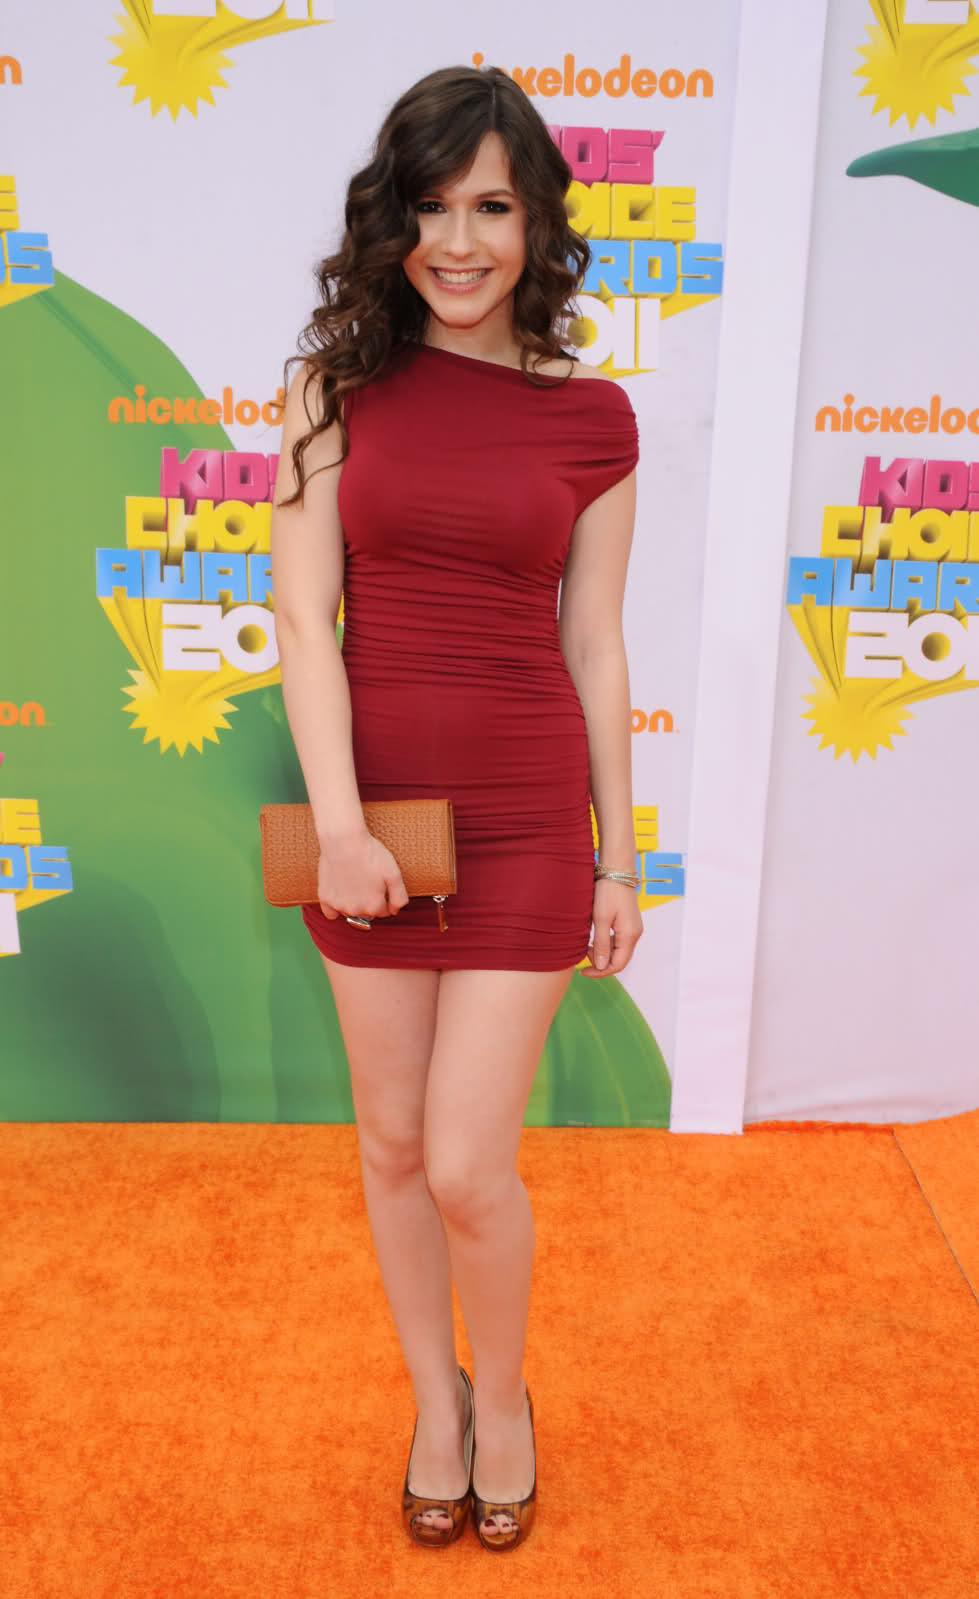 Erin Sanders: Erin Sanders Hot In Tight Dress